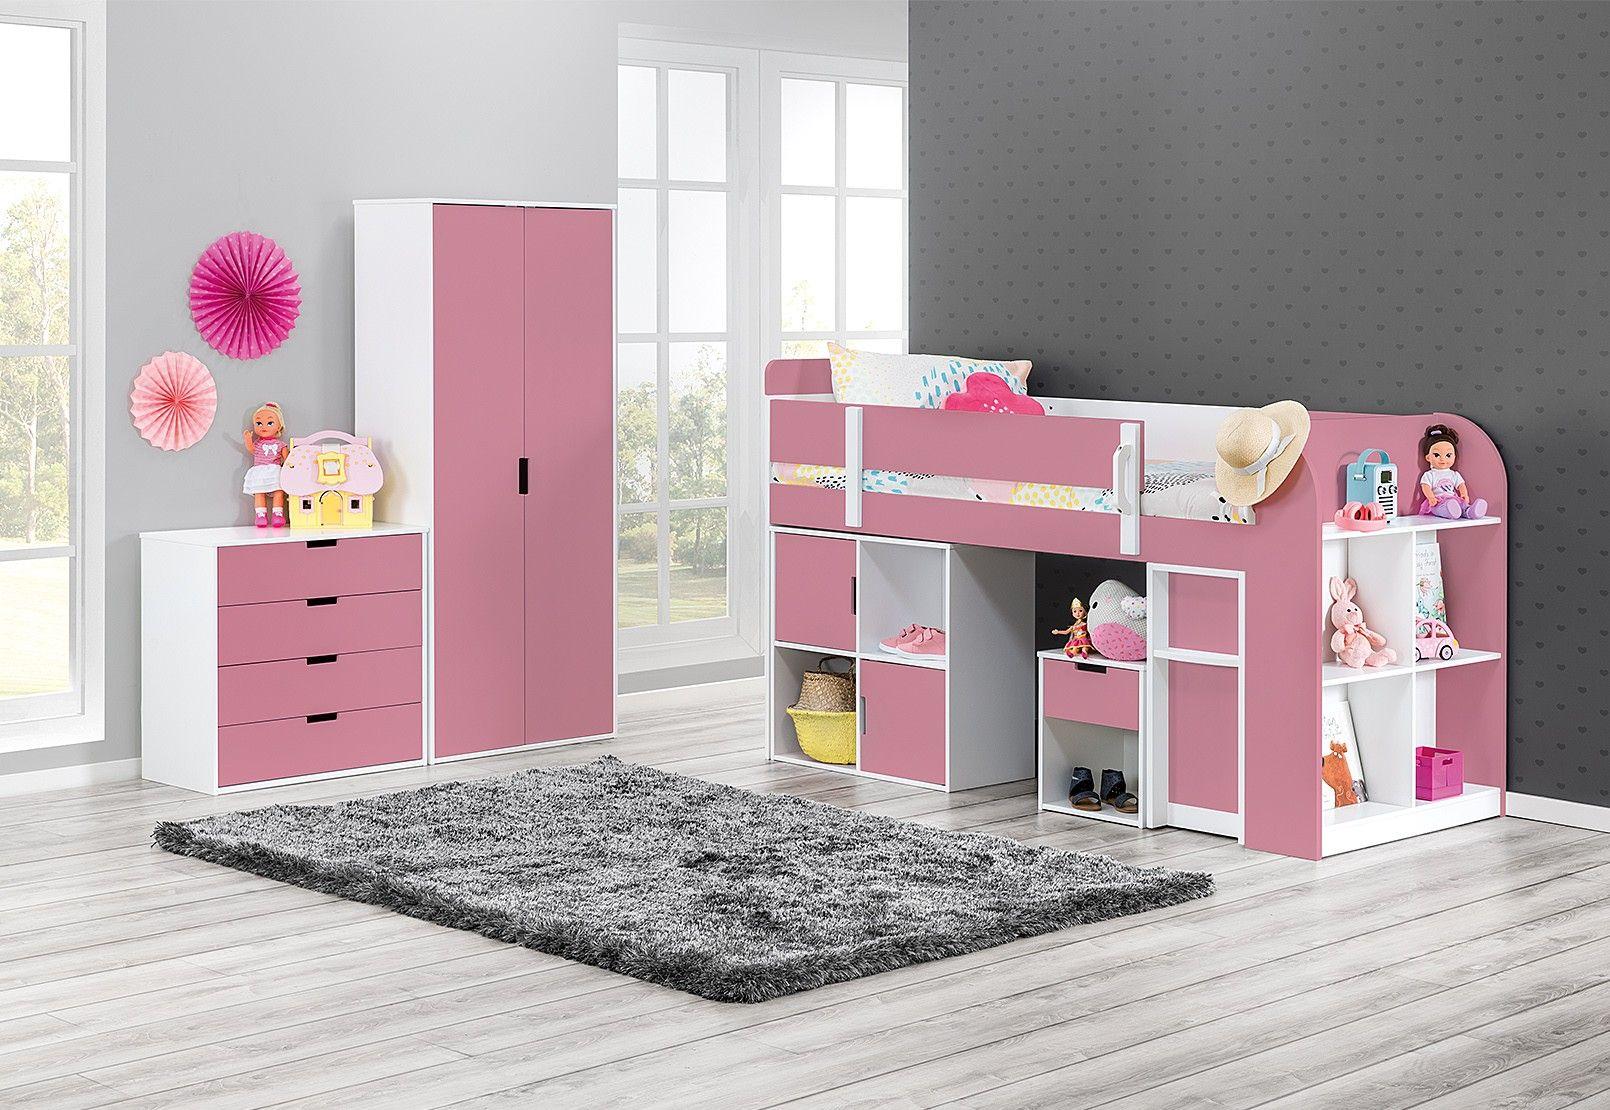 Skittle Single Loft Bunk Bed   Amart Furniture   Loft bunk ...